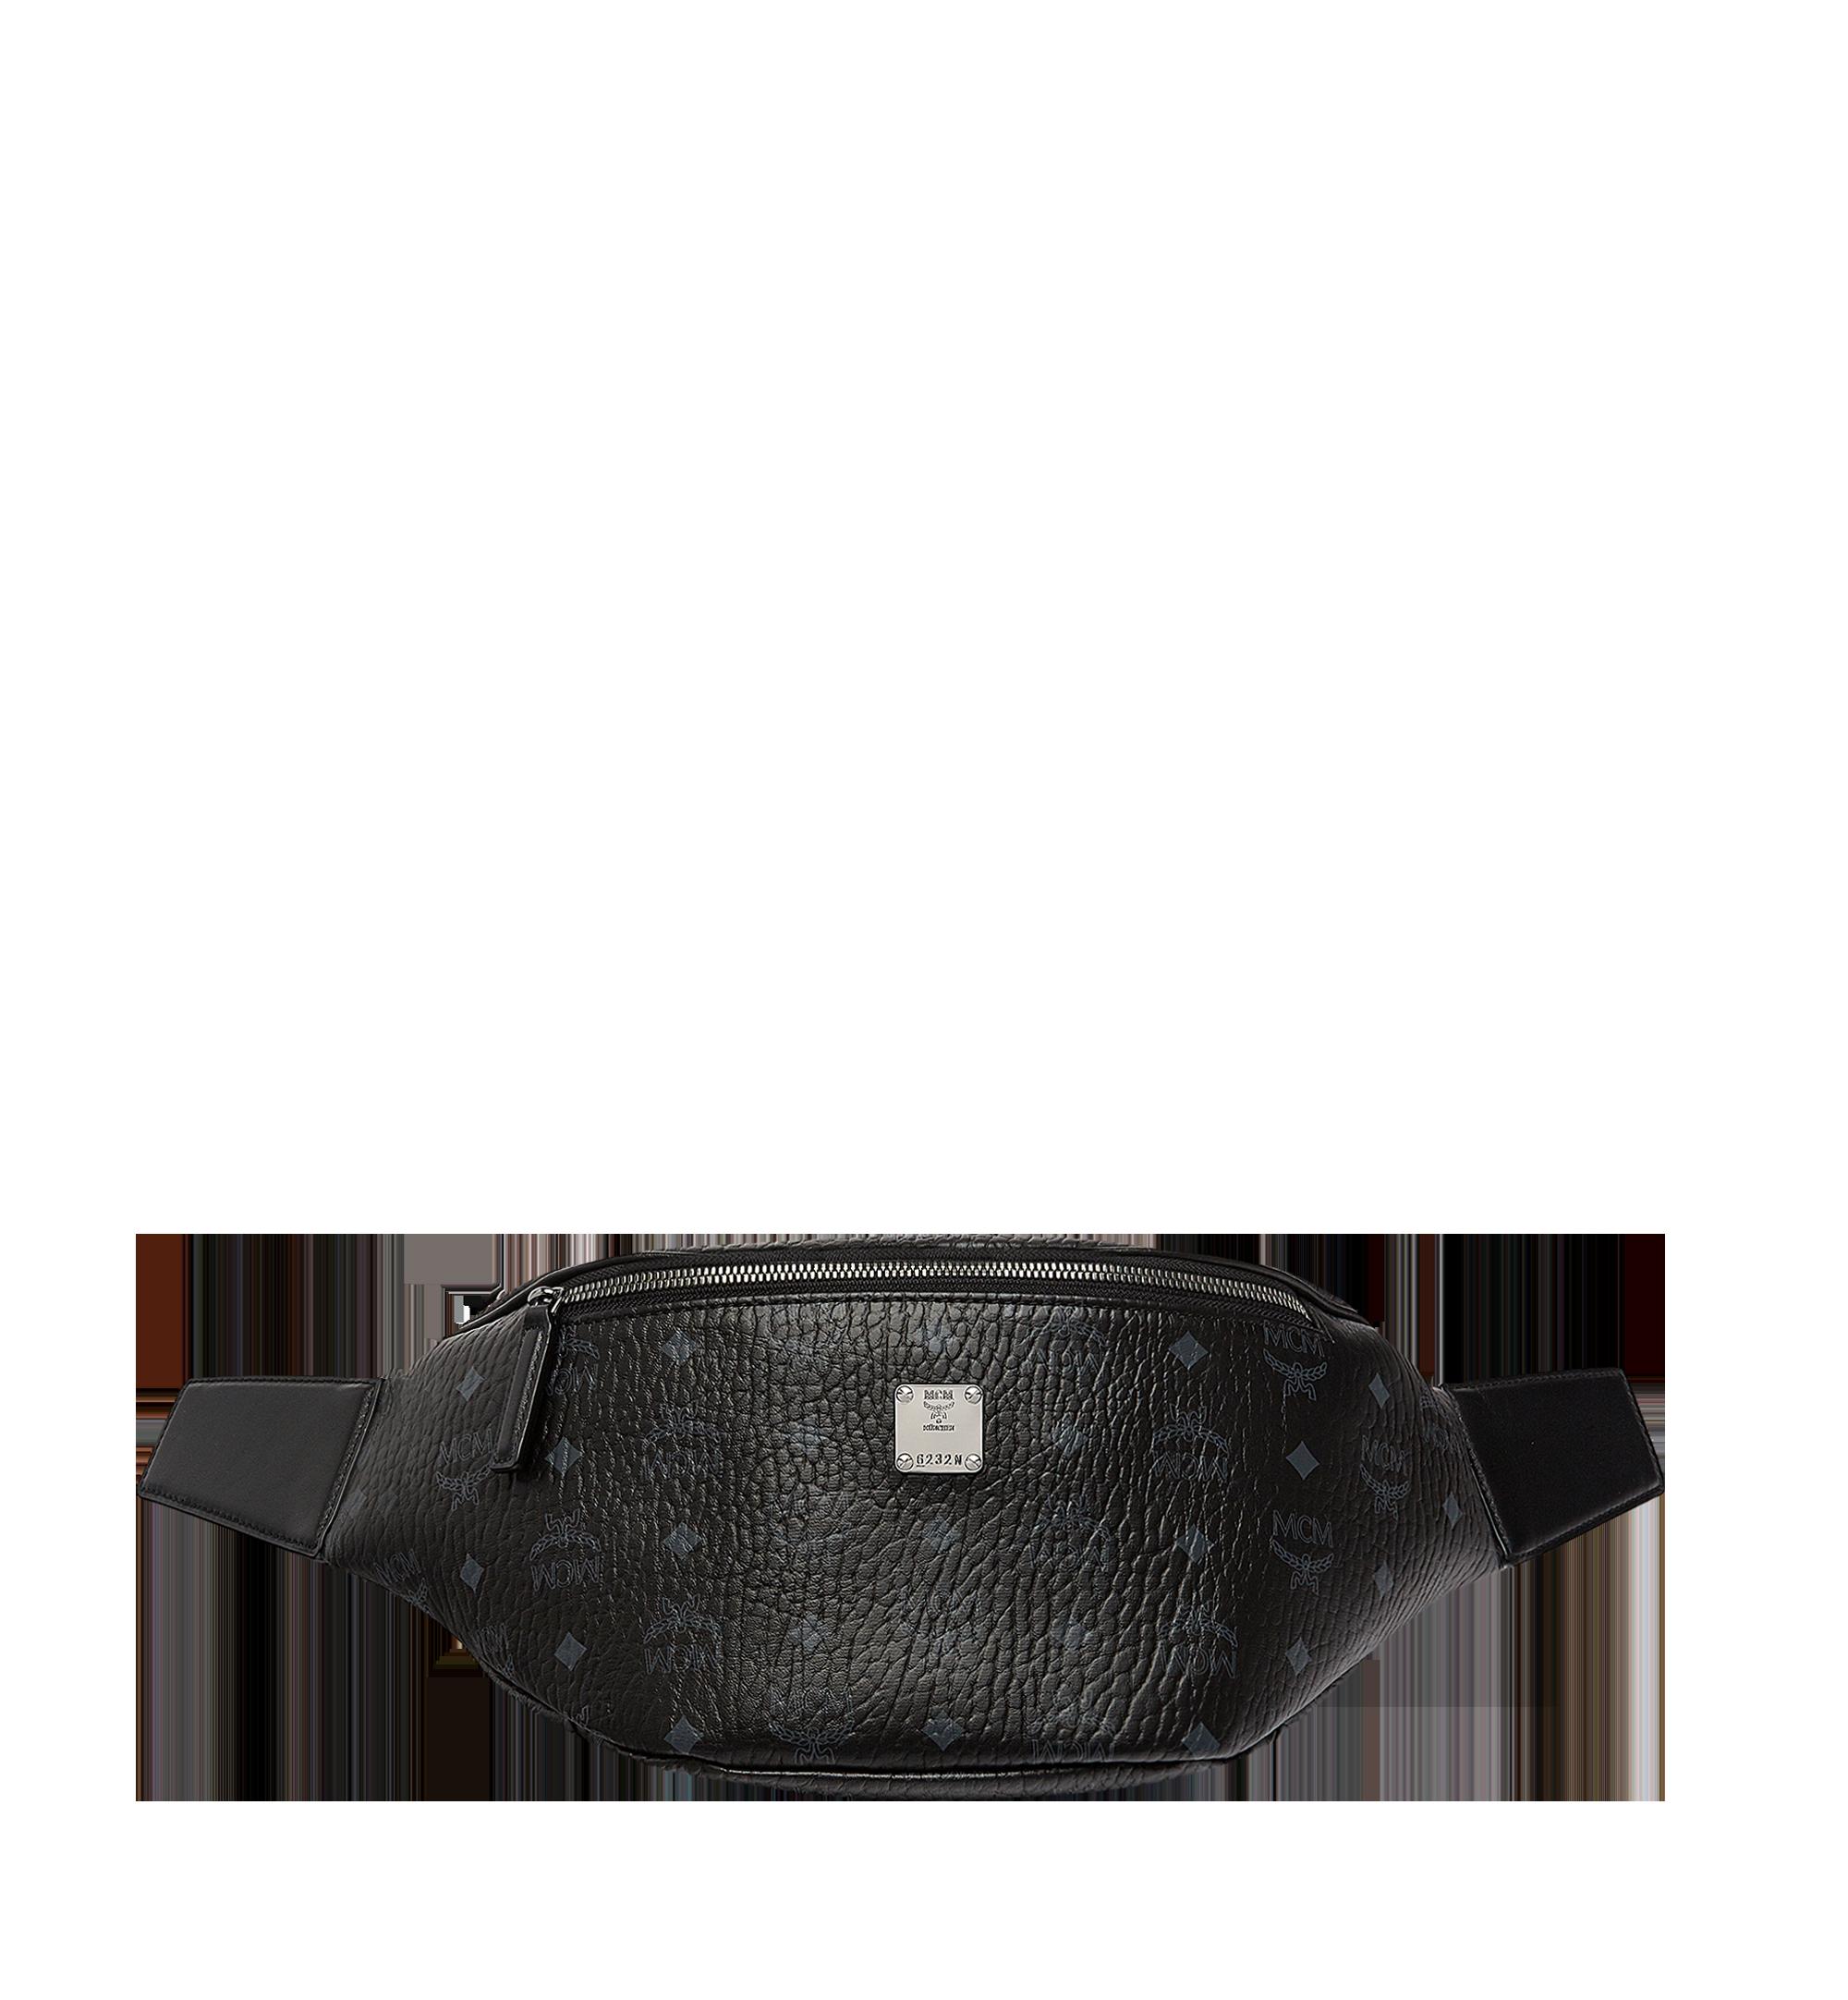 57f94448bf1 Stark Belt Bag in Visetos